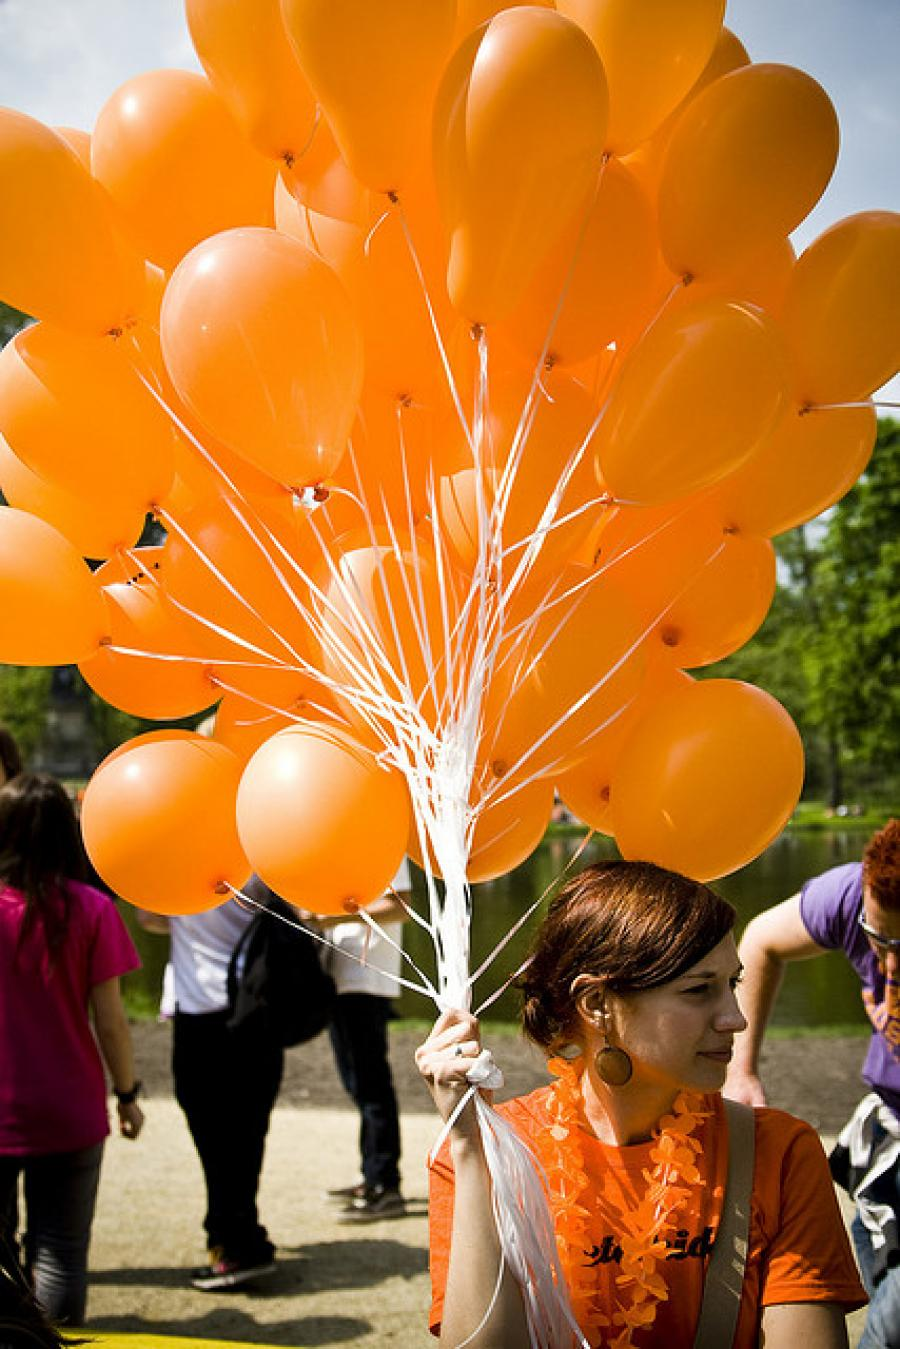 Partying in orange at Koninginnedag 2012